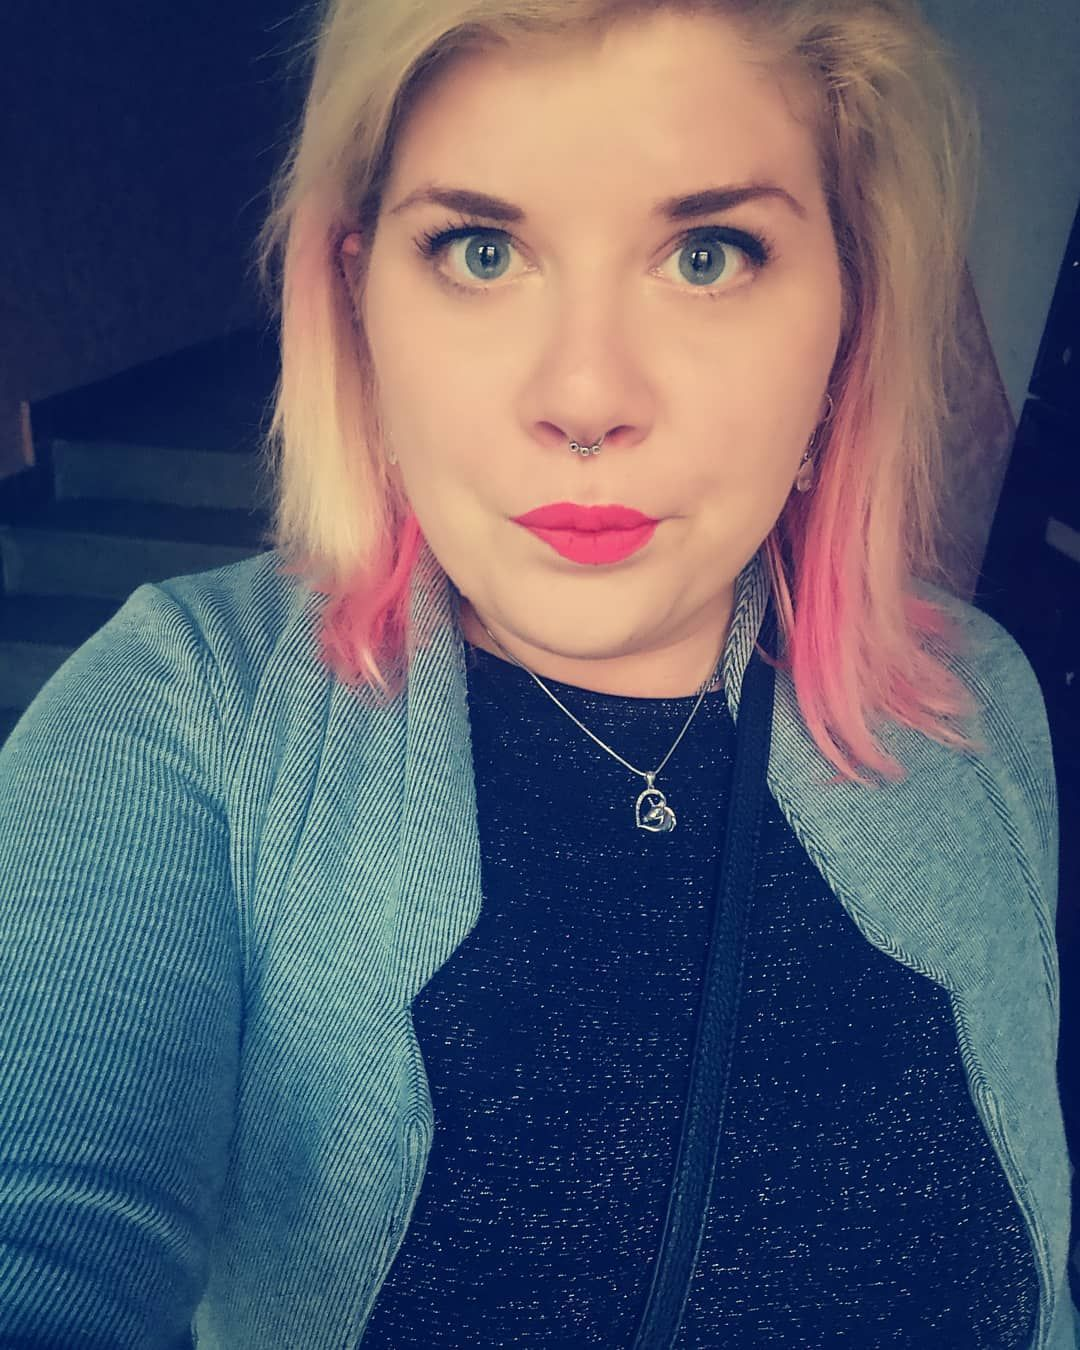 #summer #work #czechrepublic #czech #ostrava #stefkovicfoto #ok #saturday #nikafoto #blonde #blondhair #pinkhair #septum #septumpiercing